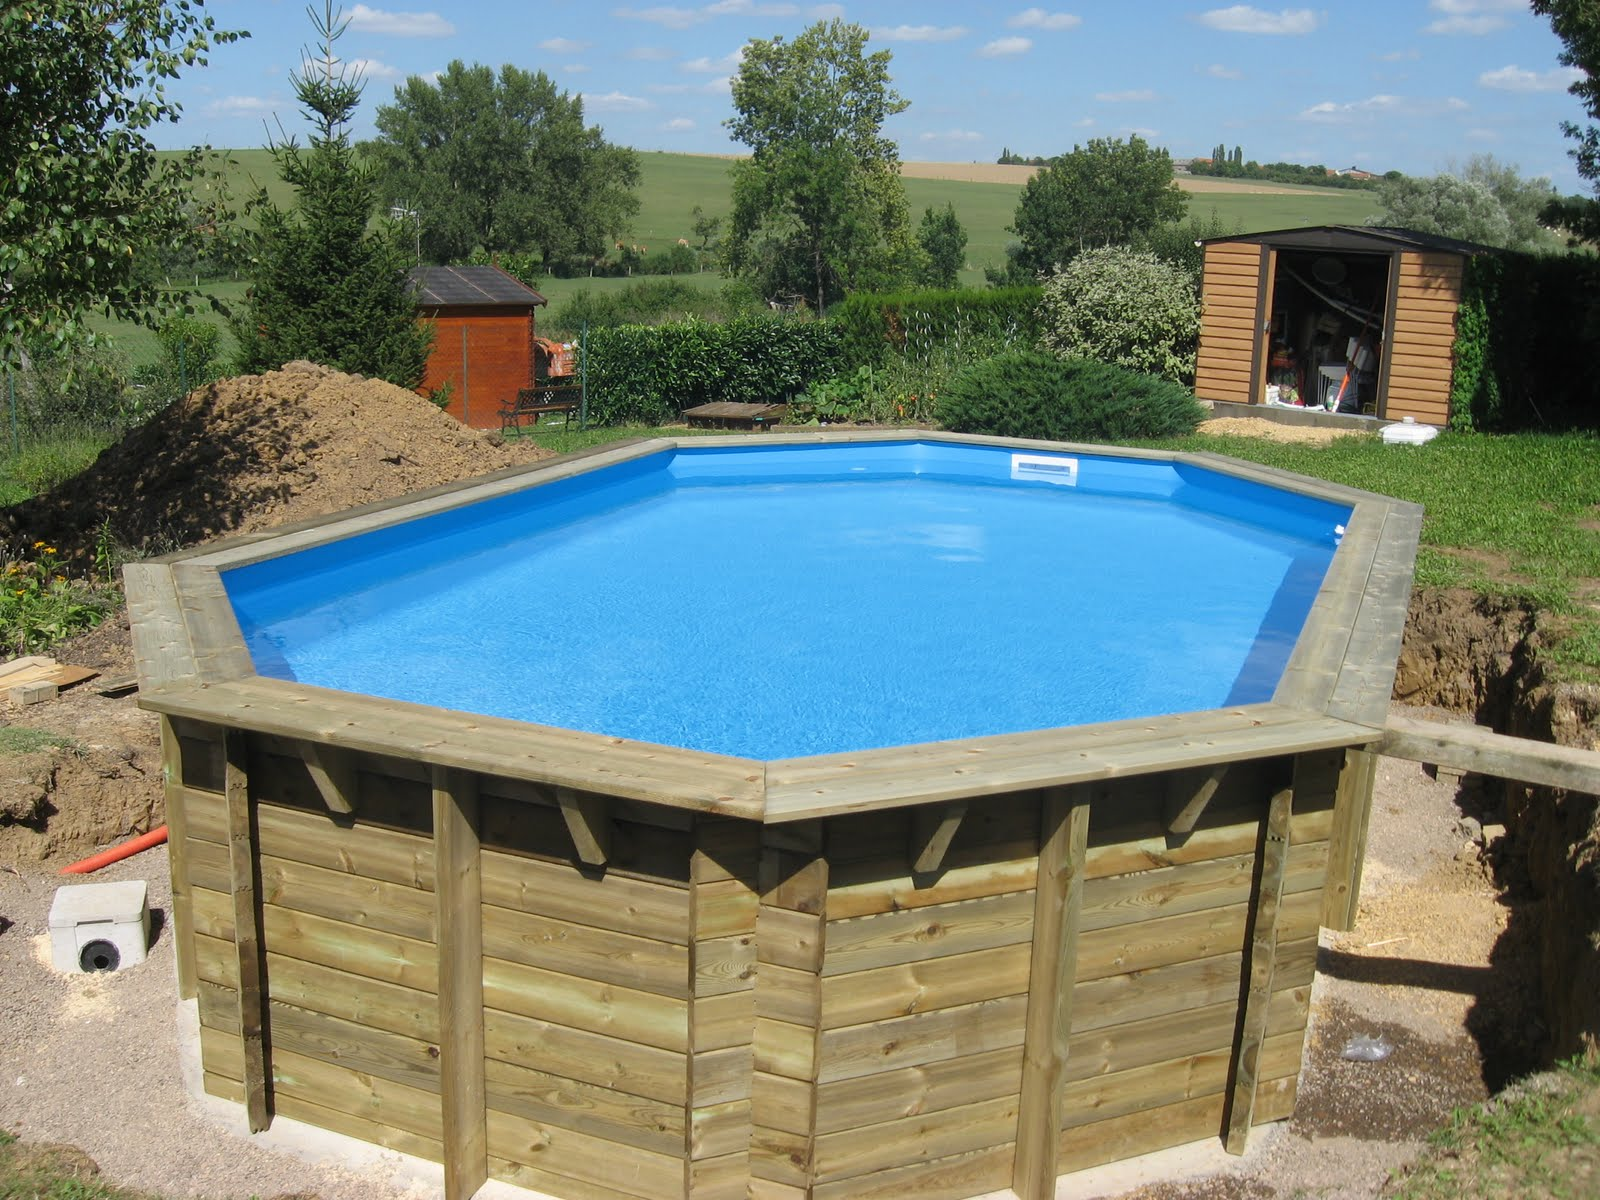 piscine semi enterr e. Black Bedroom Furniture Sets. Home Design Ideas